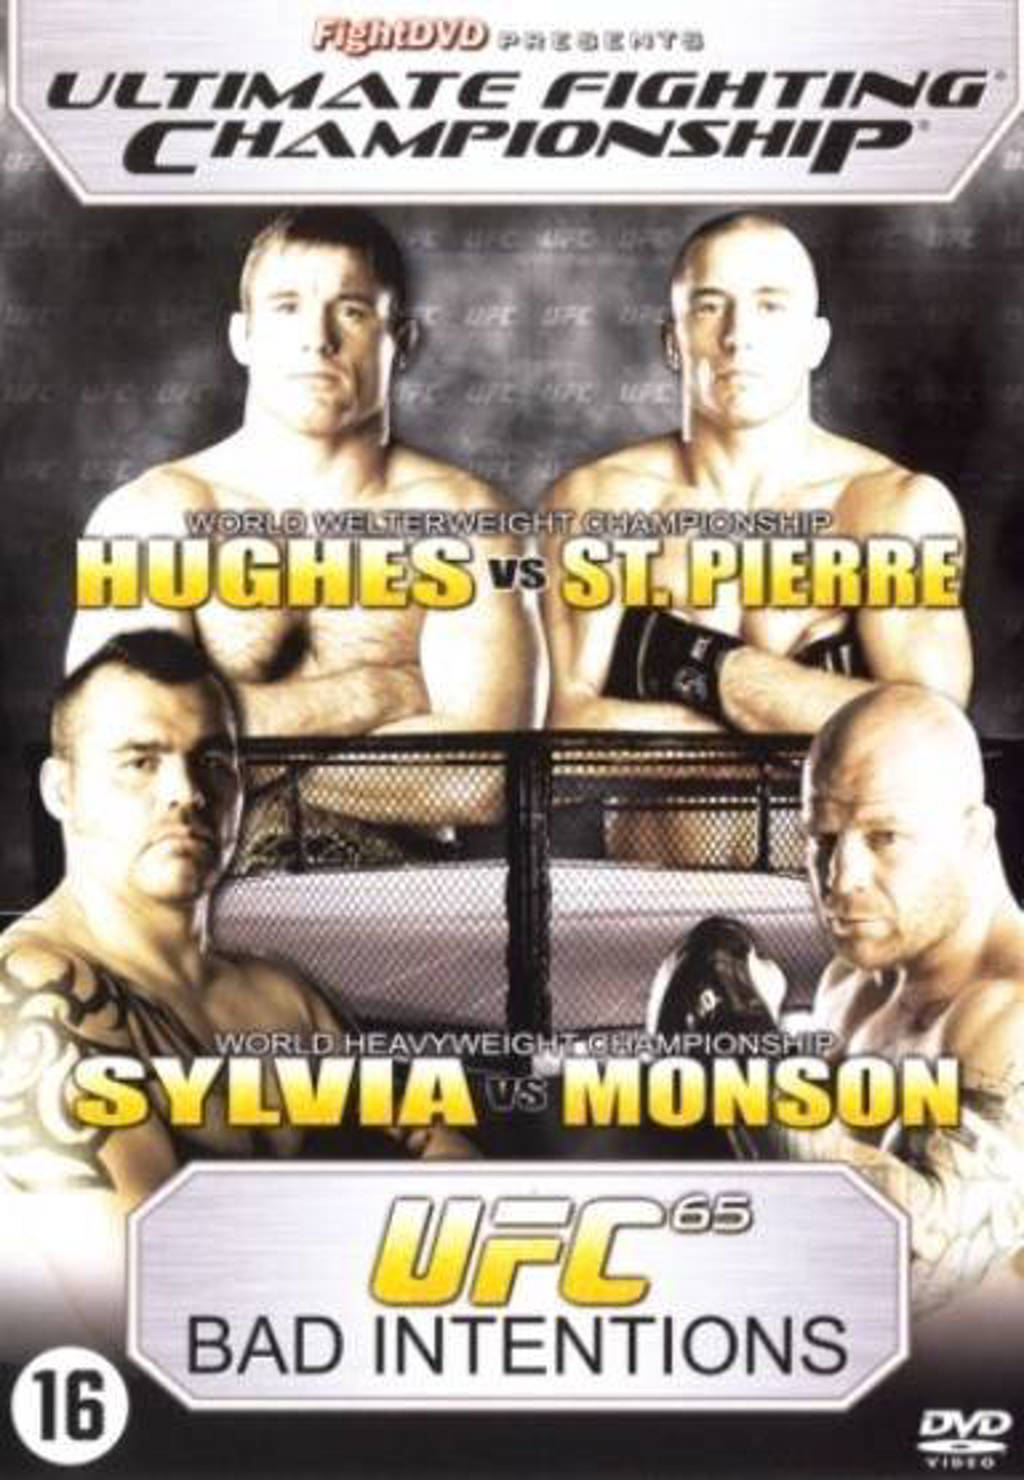 UFC-UFC 65 bad intentions (DVD)